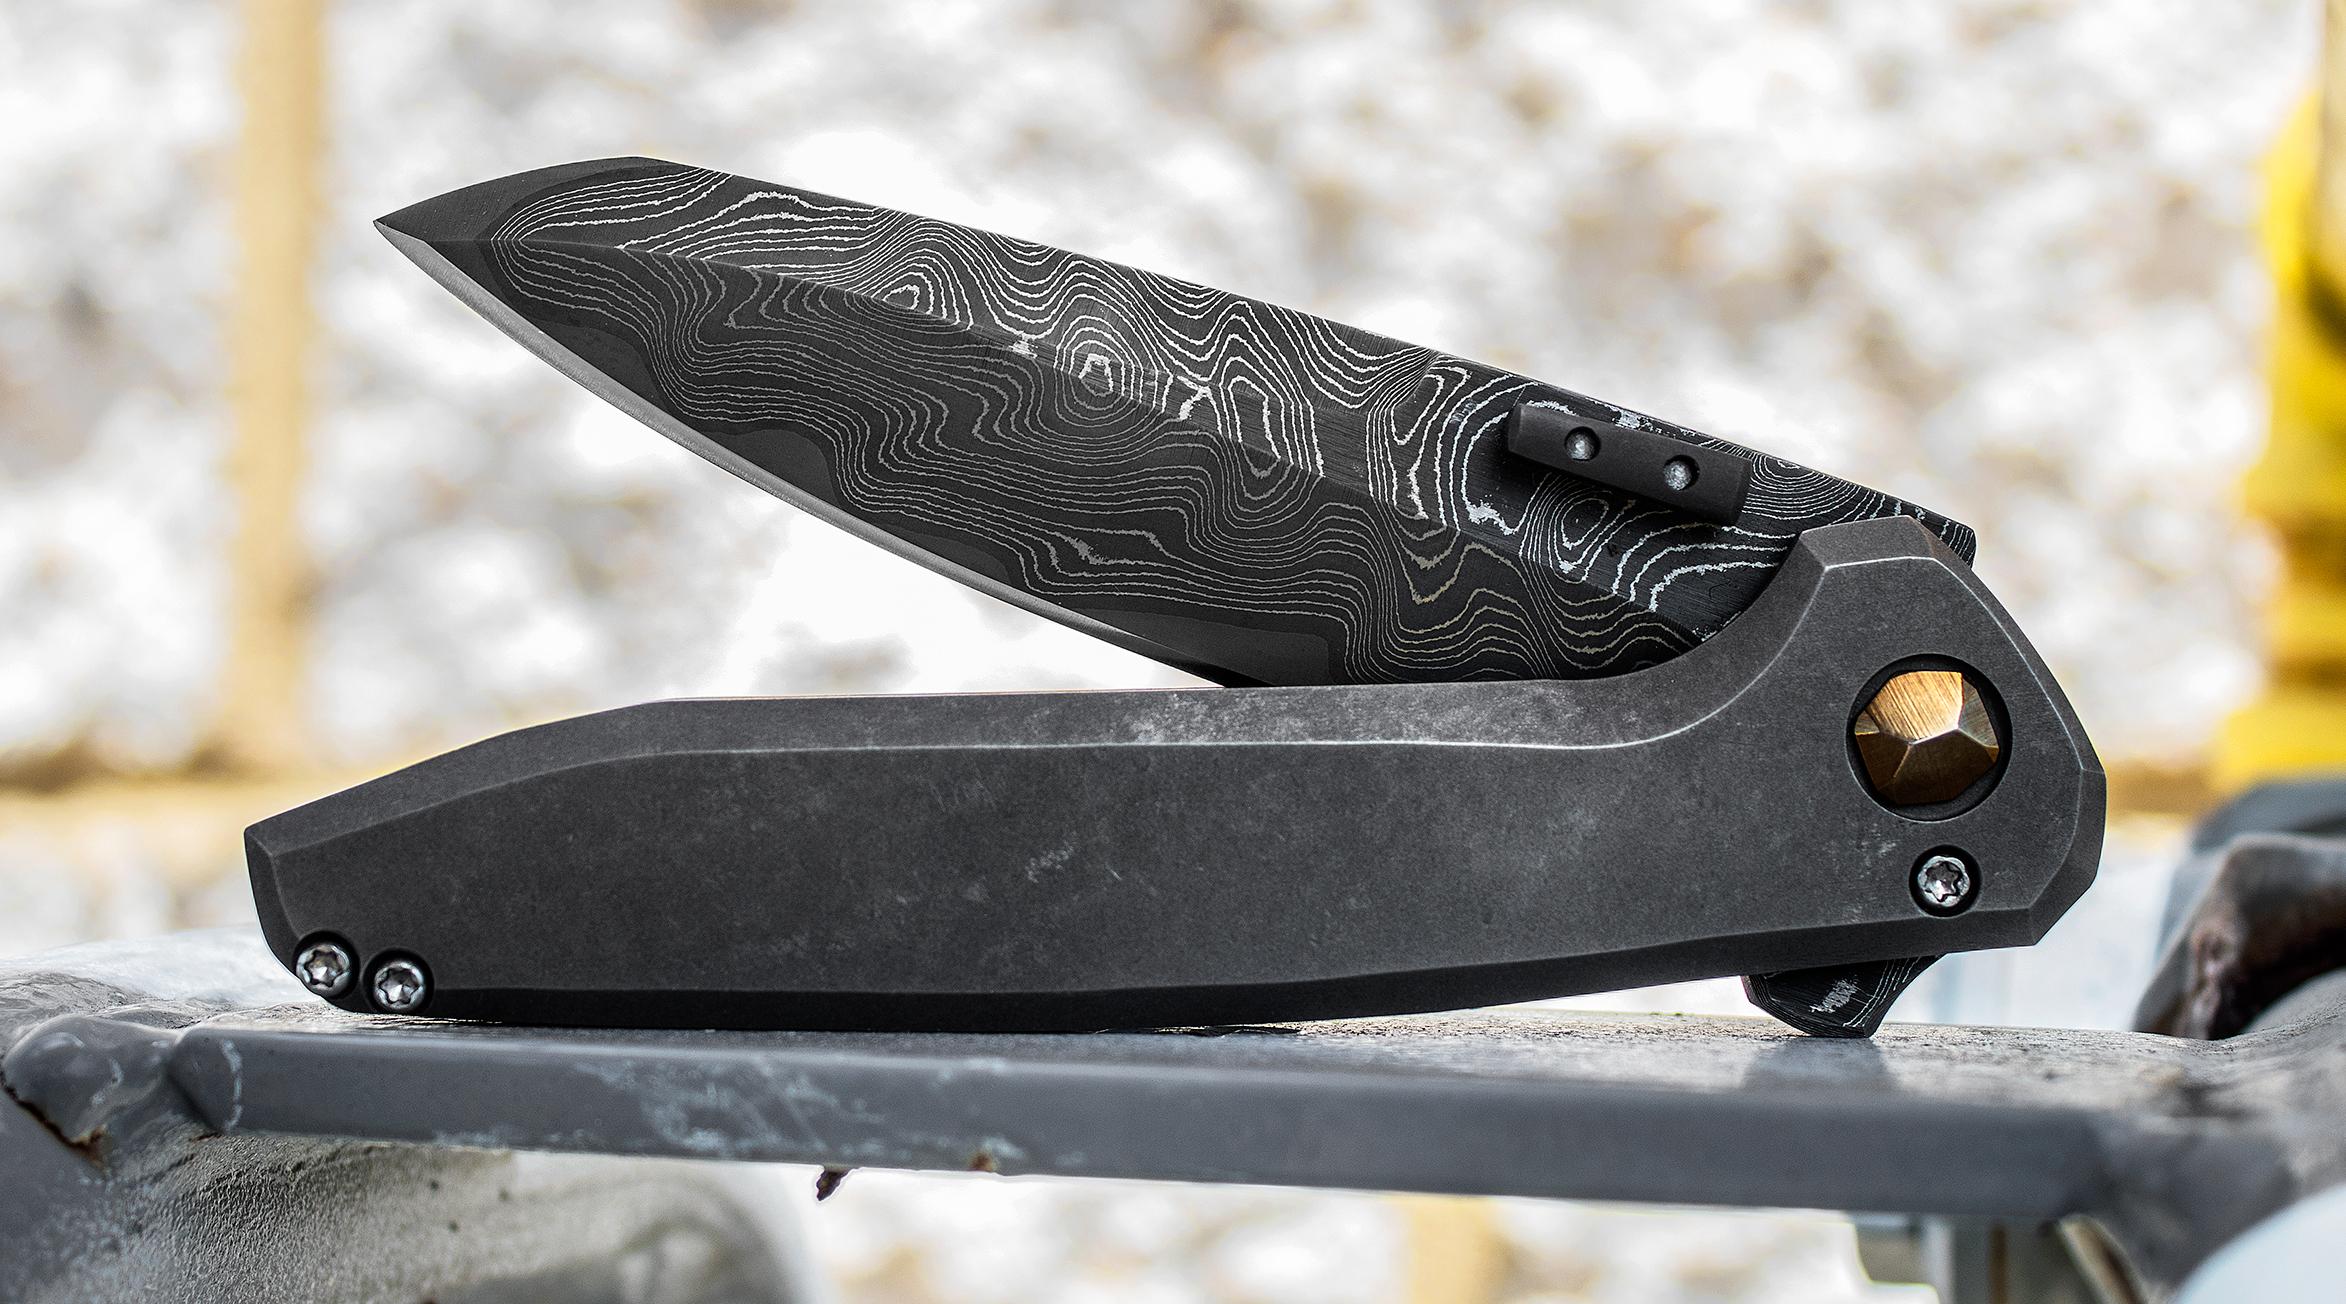 Nova Blades